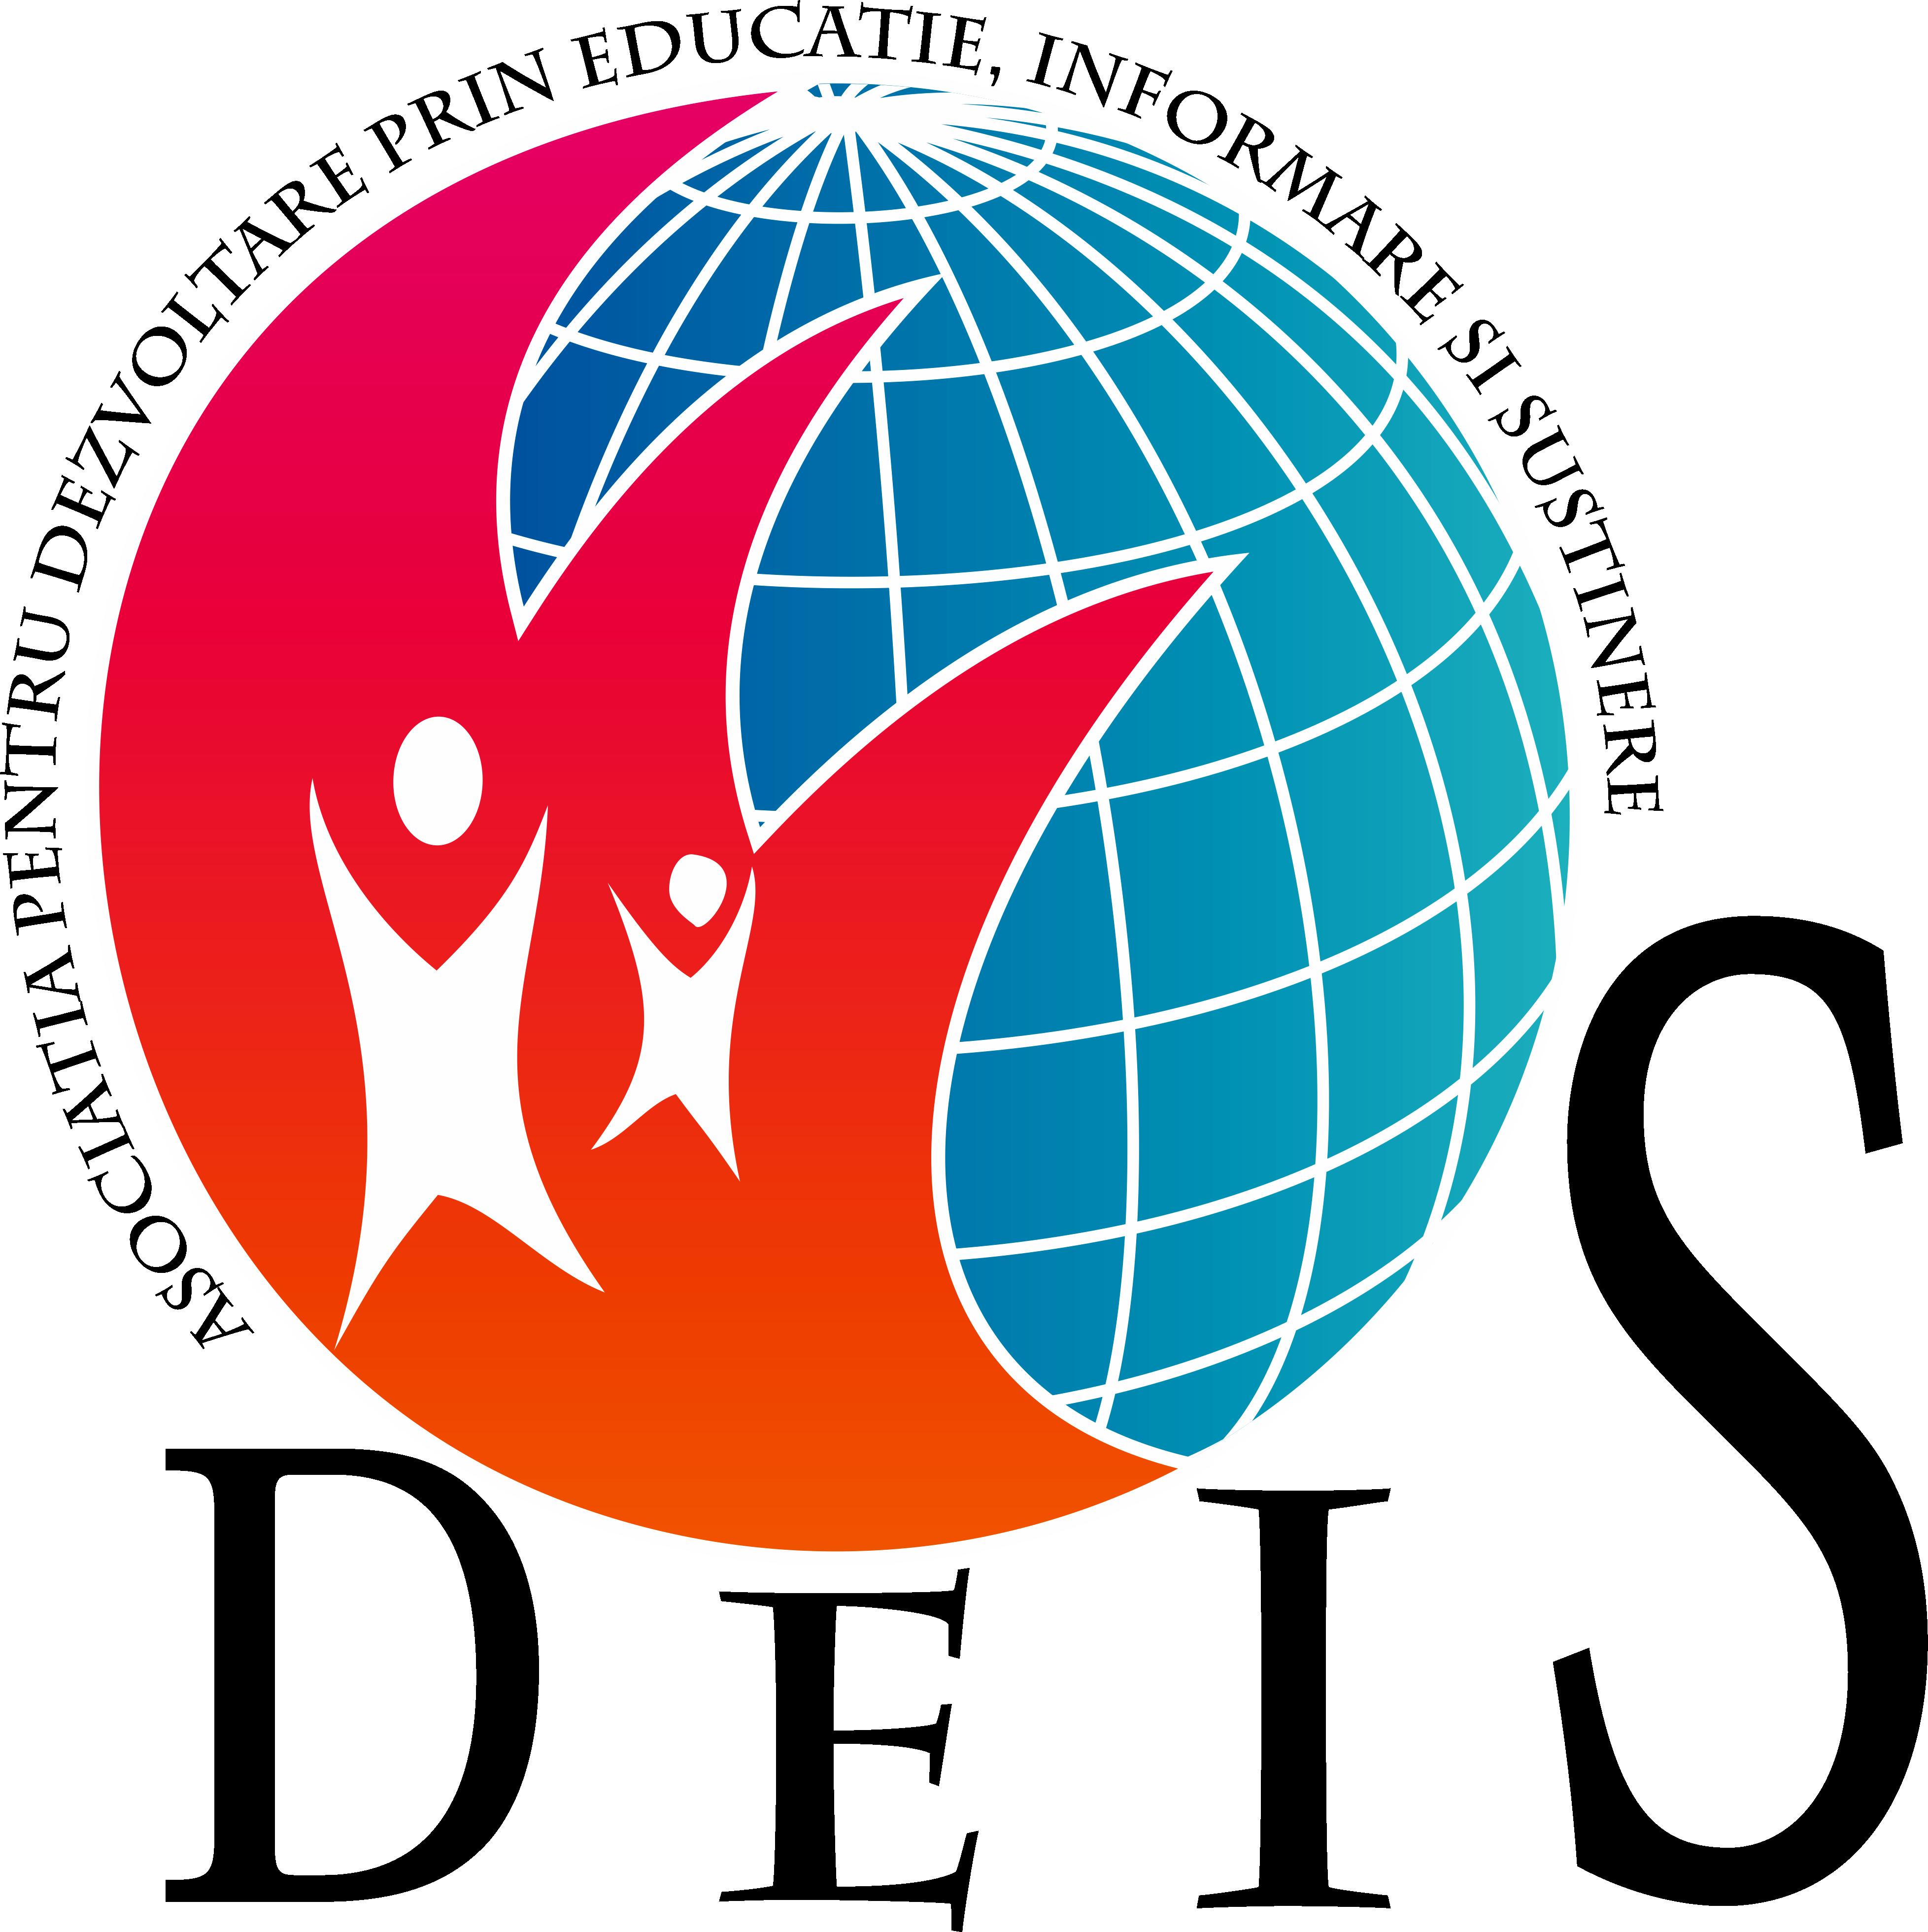 Asociatia pentru Dezvoltare prin Educatie, Informare si Sustinere - D.E.I.S. logo